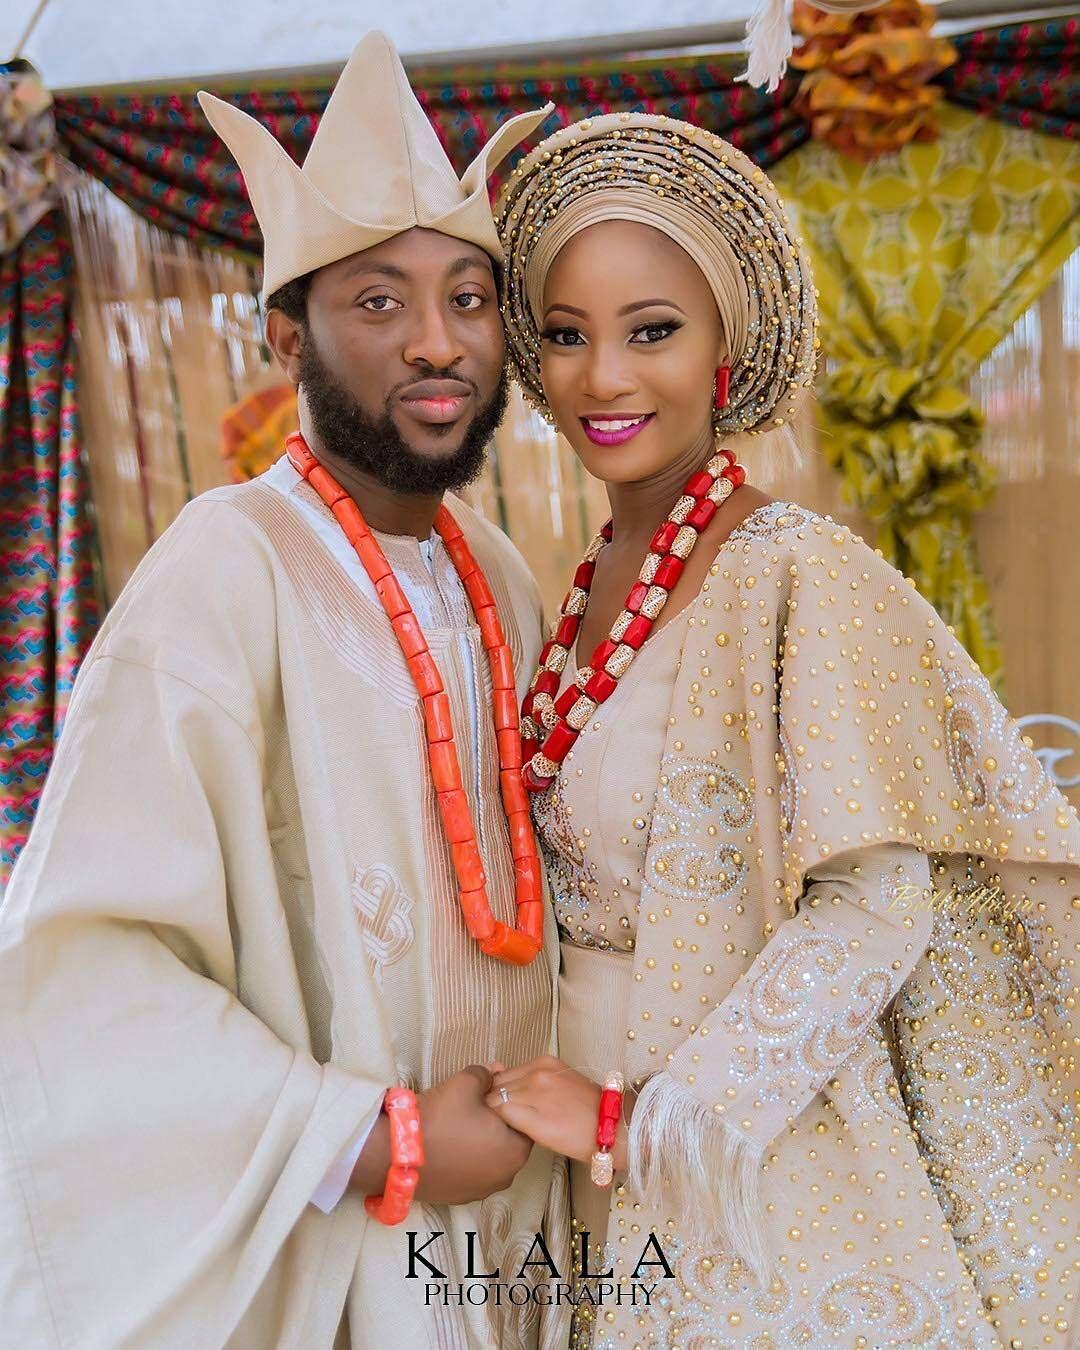 Traditional wedding attire when a fine yoruba gentleman marries his